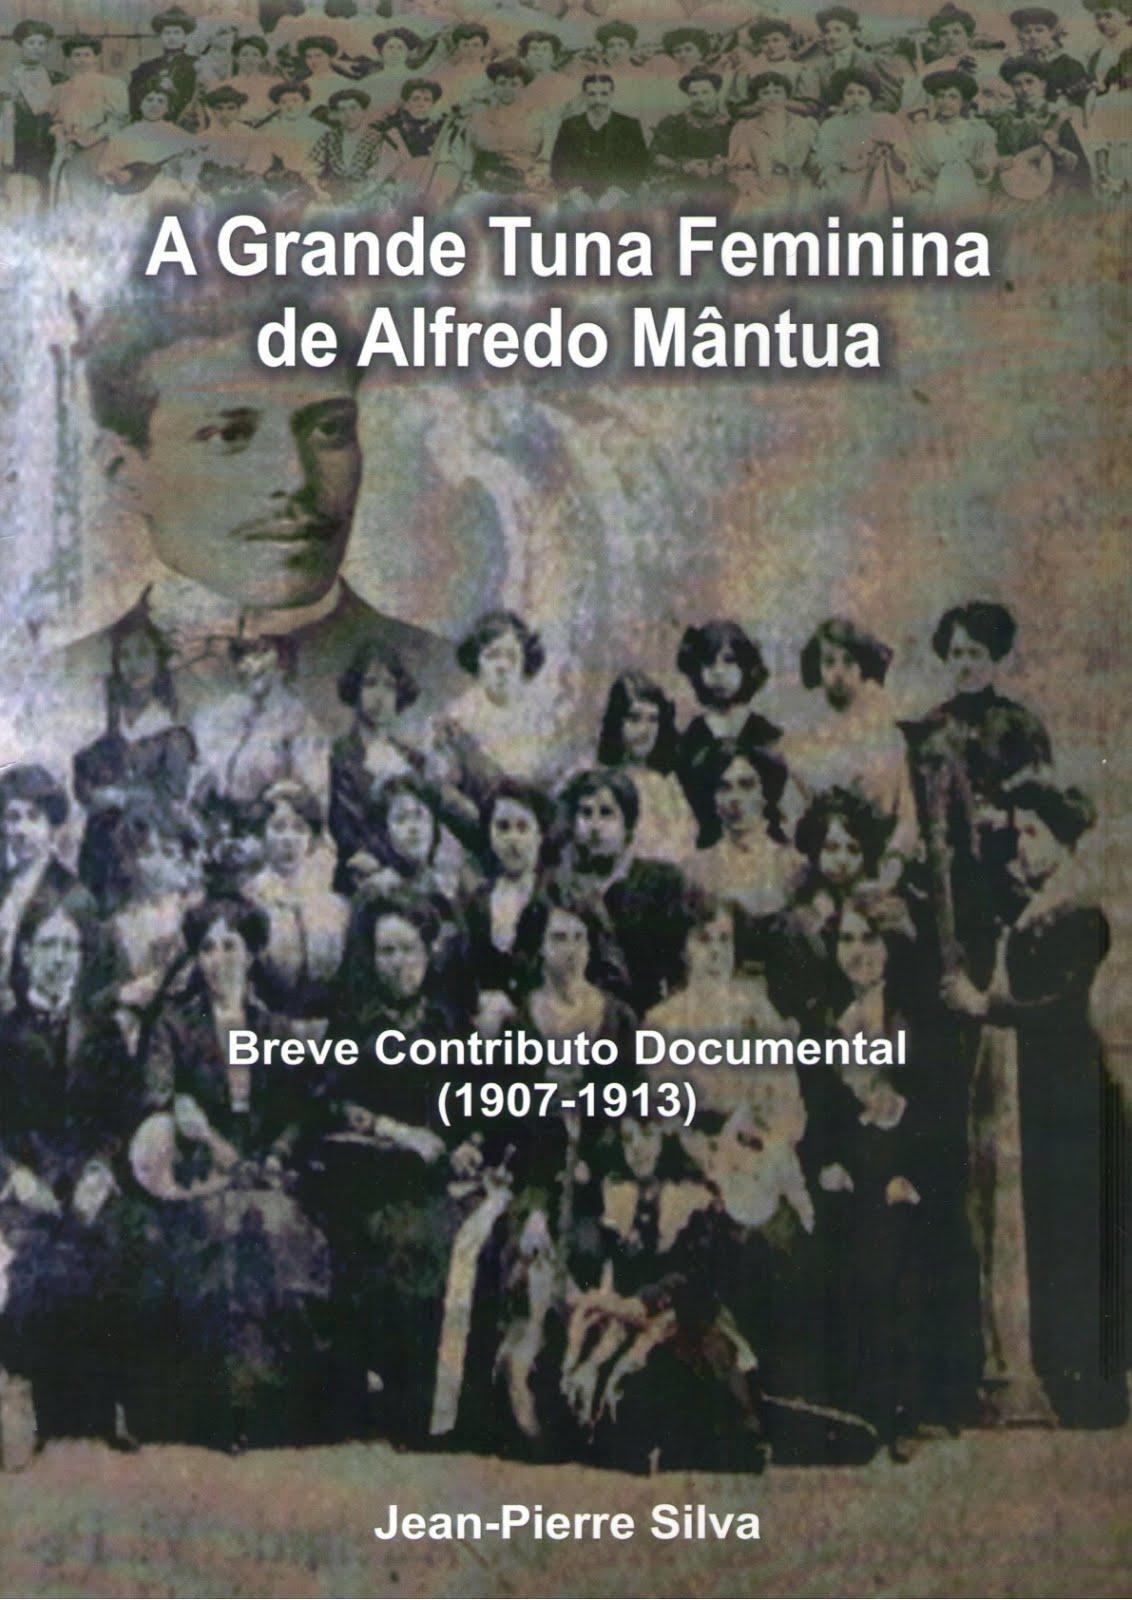 A Grande Tuna Feminina de Alfredo Mântua